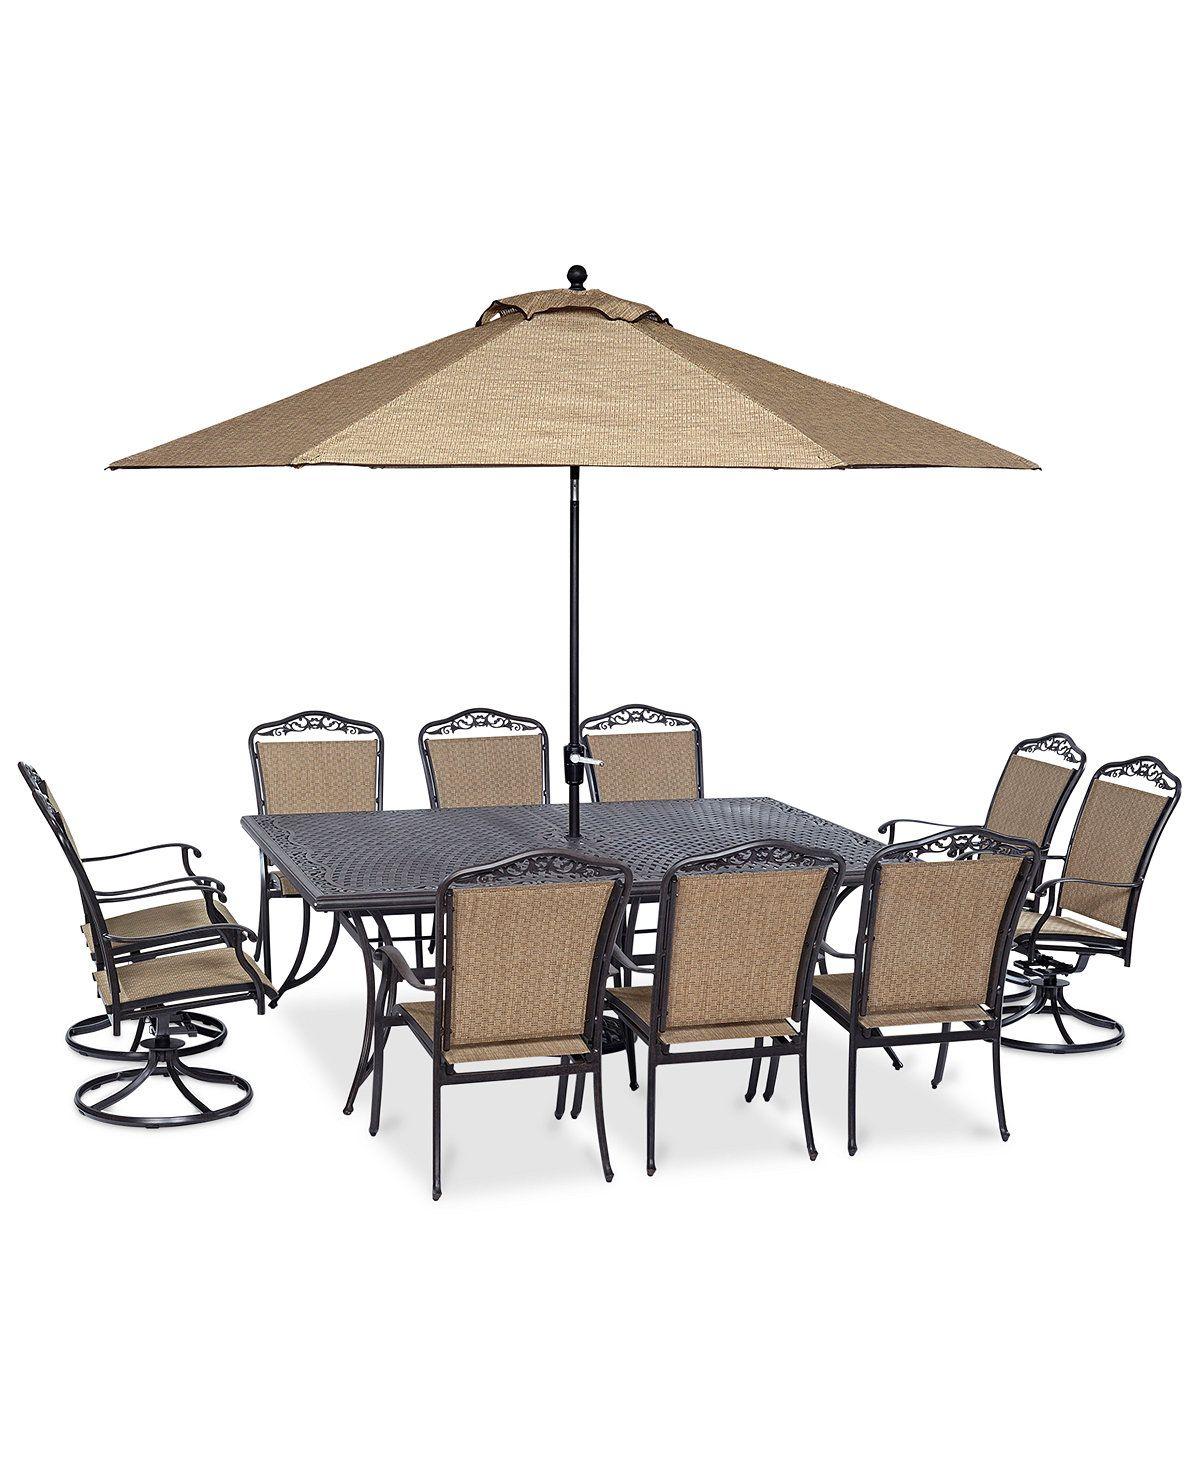 Beachmont Ii Outdoor 11 Pc Dining Set